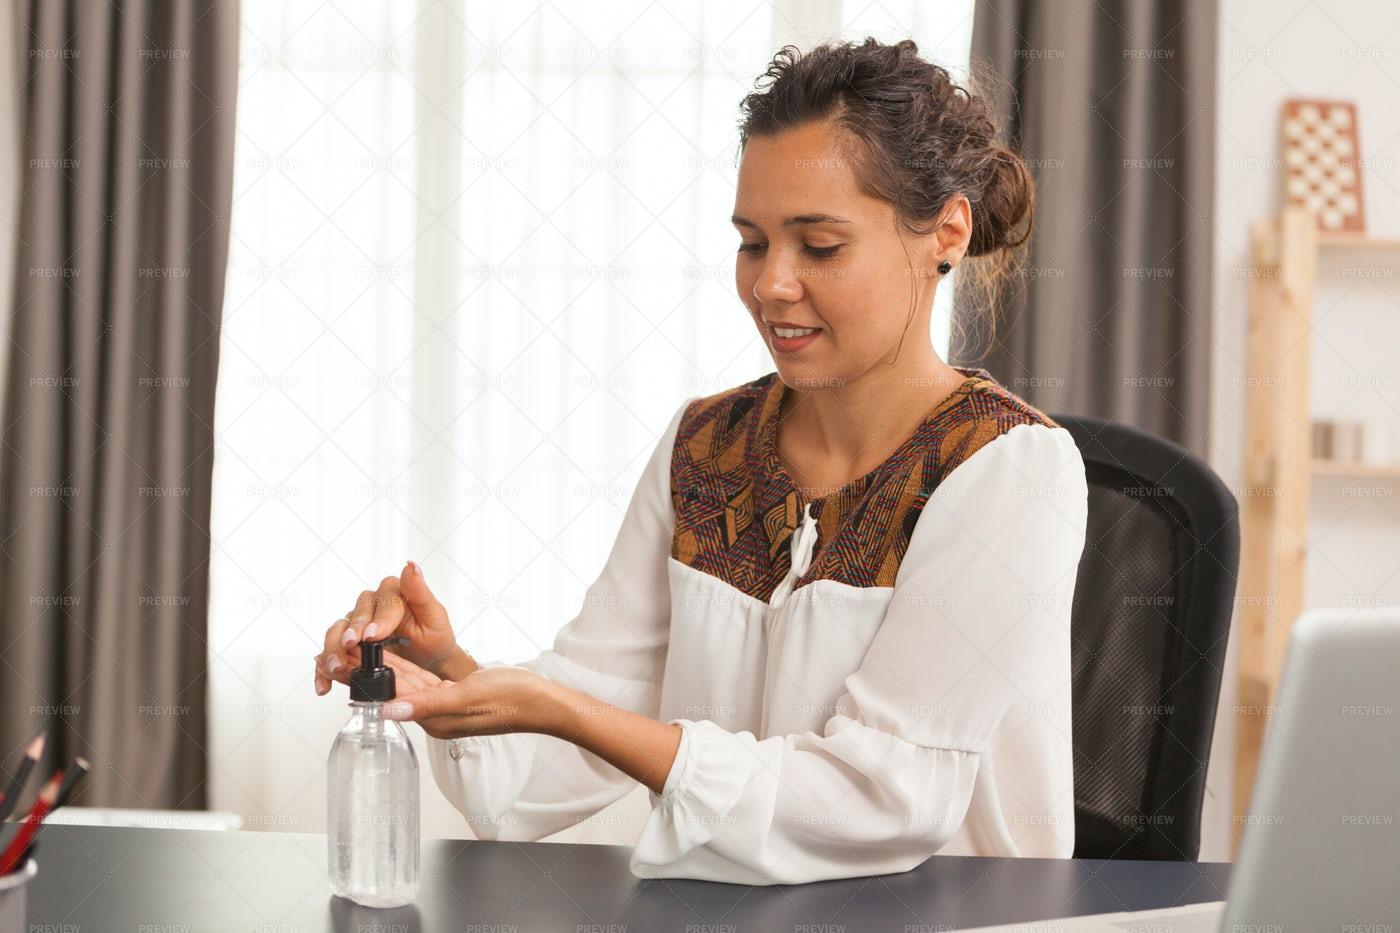 Woman Disinfecting Her Hands: Stock Photos